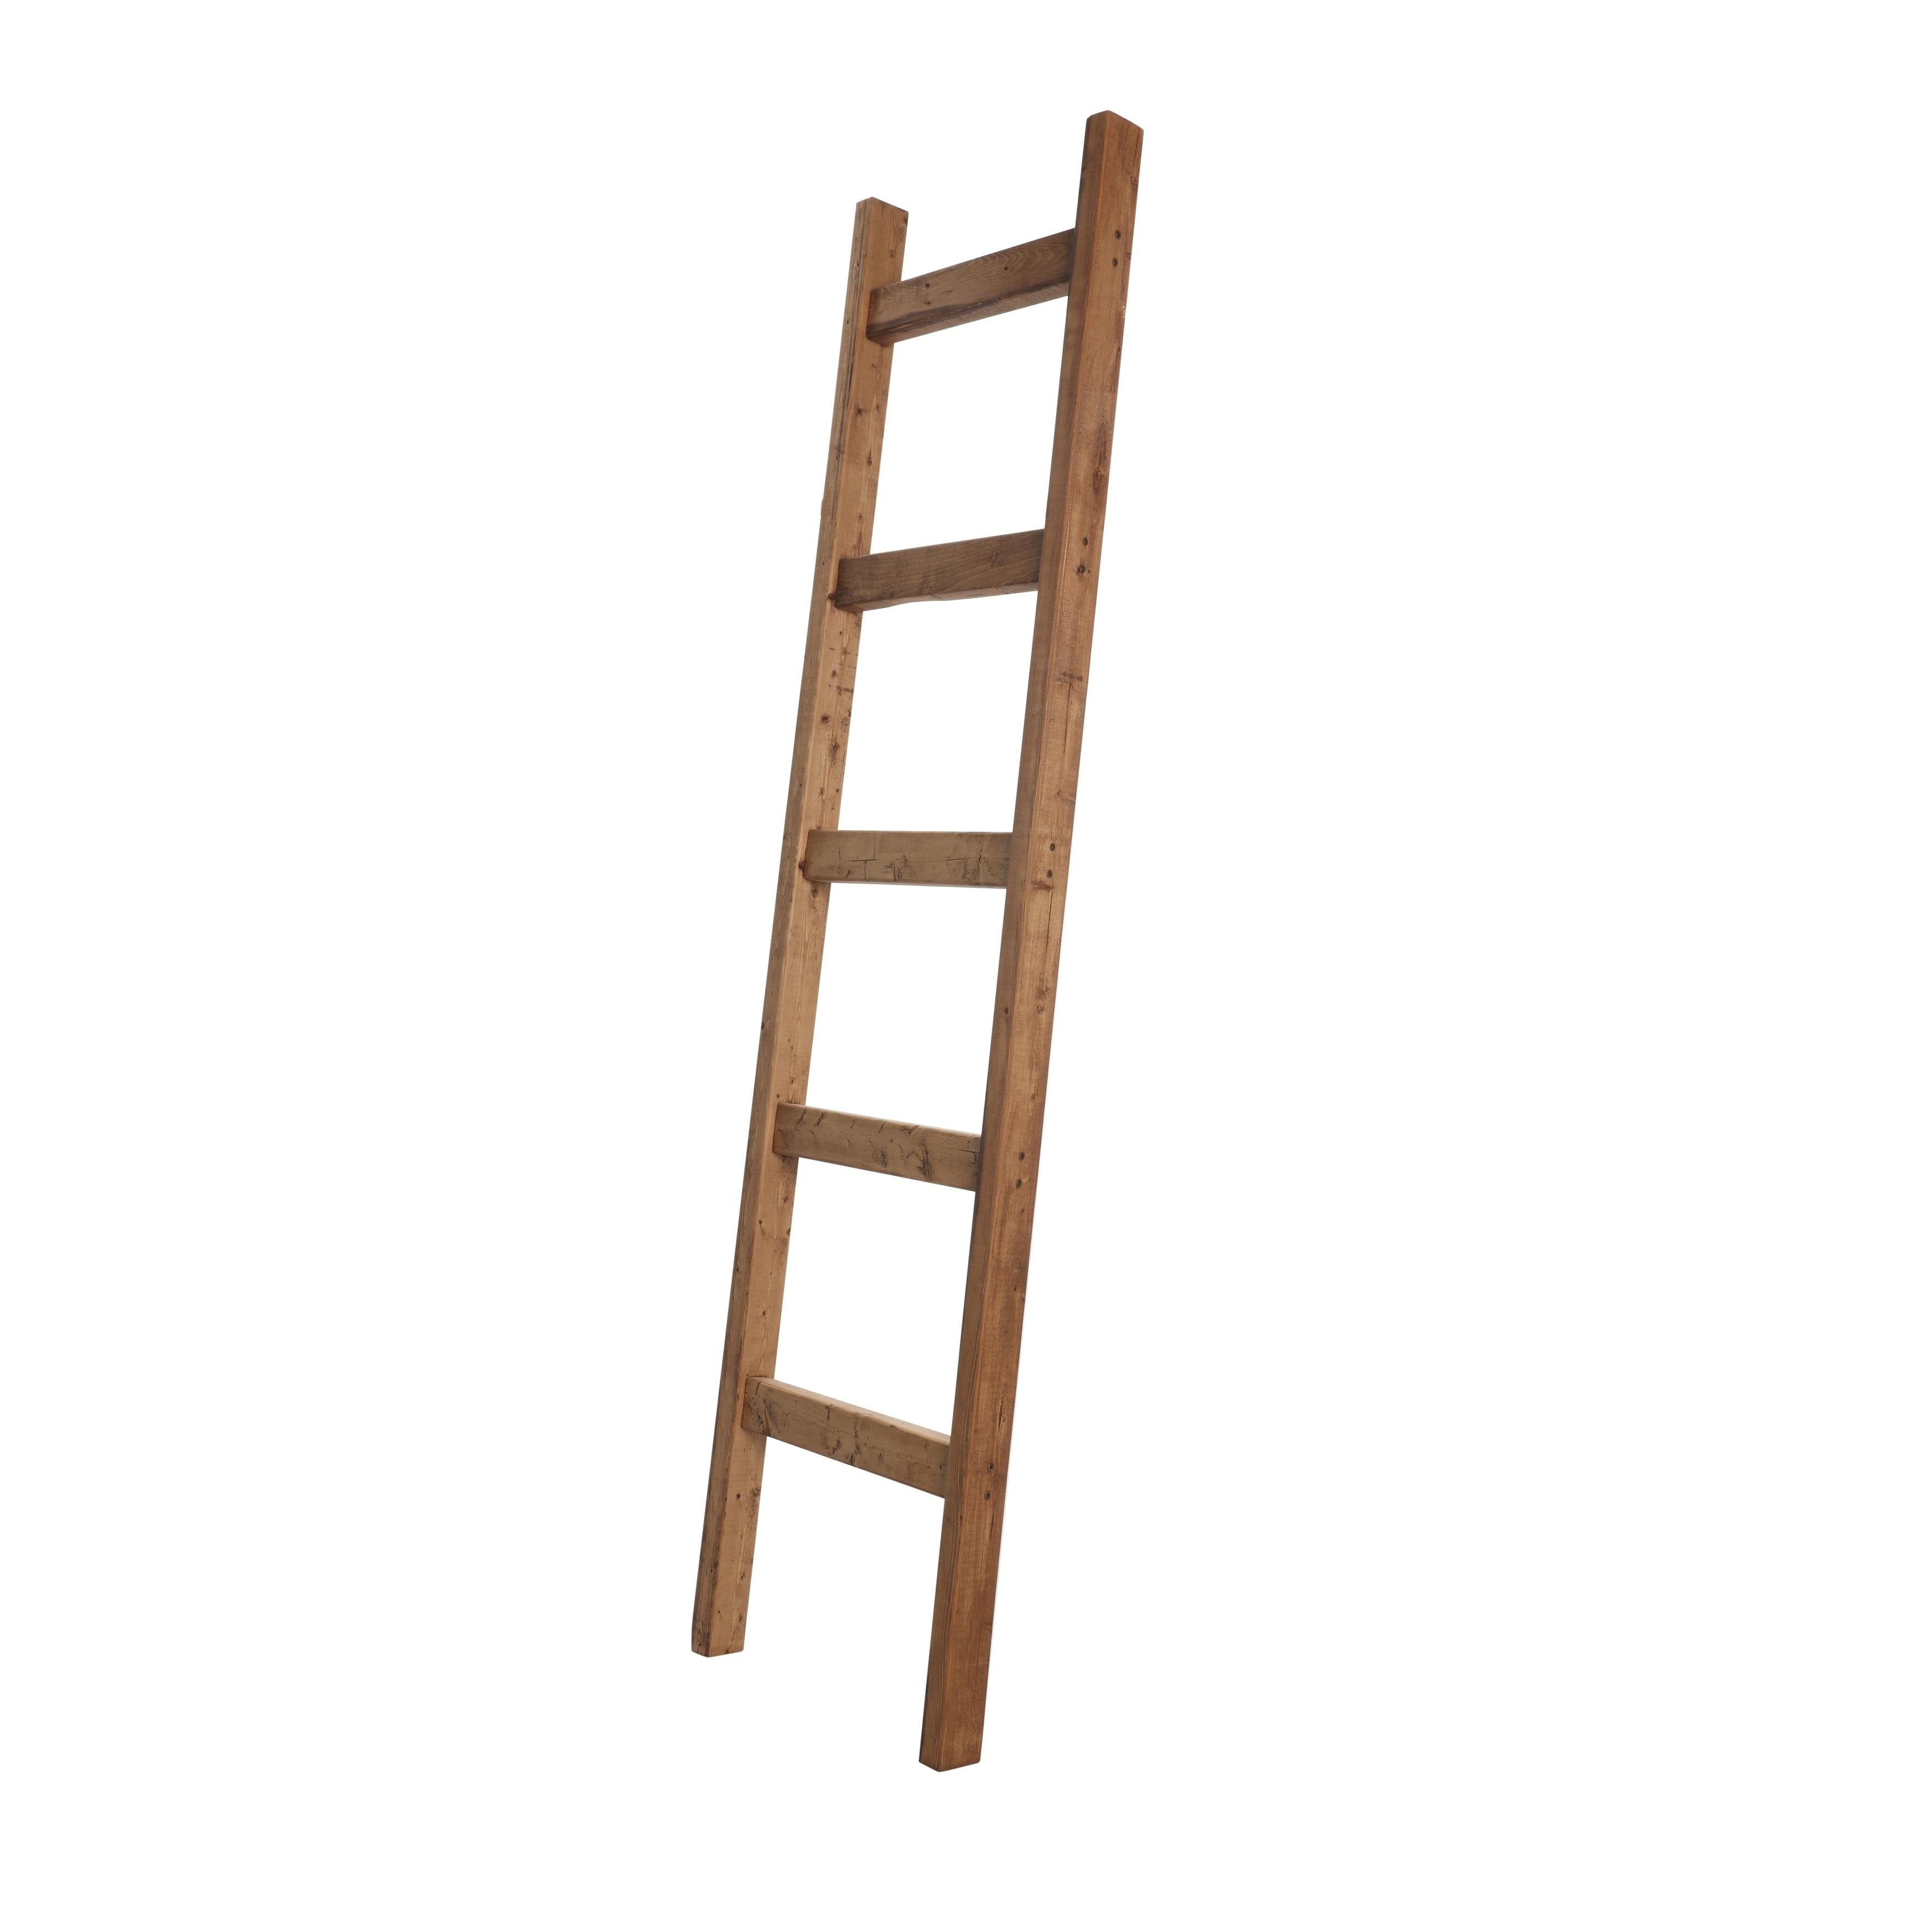 Farmhouse Decorative Wooden Blanket Ladder